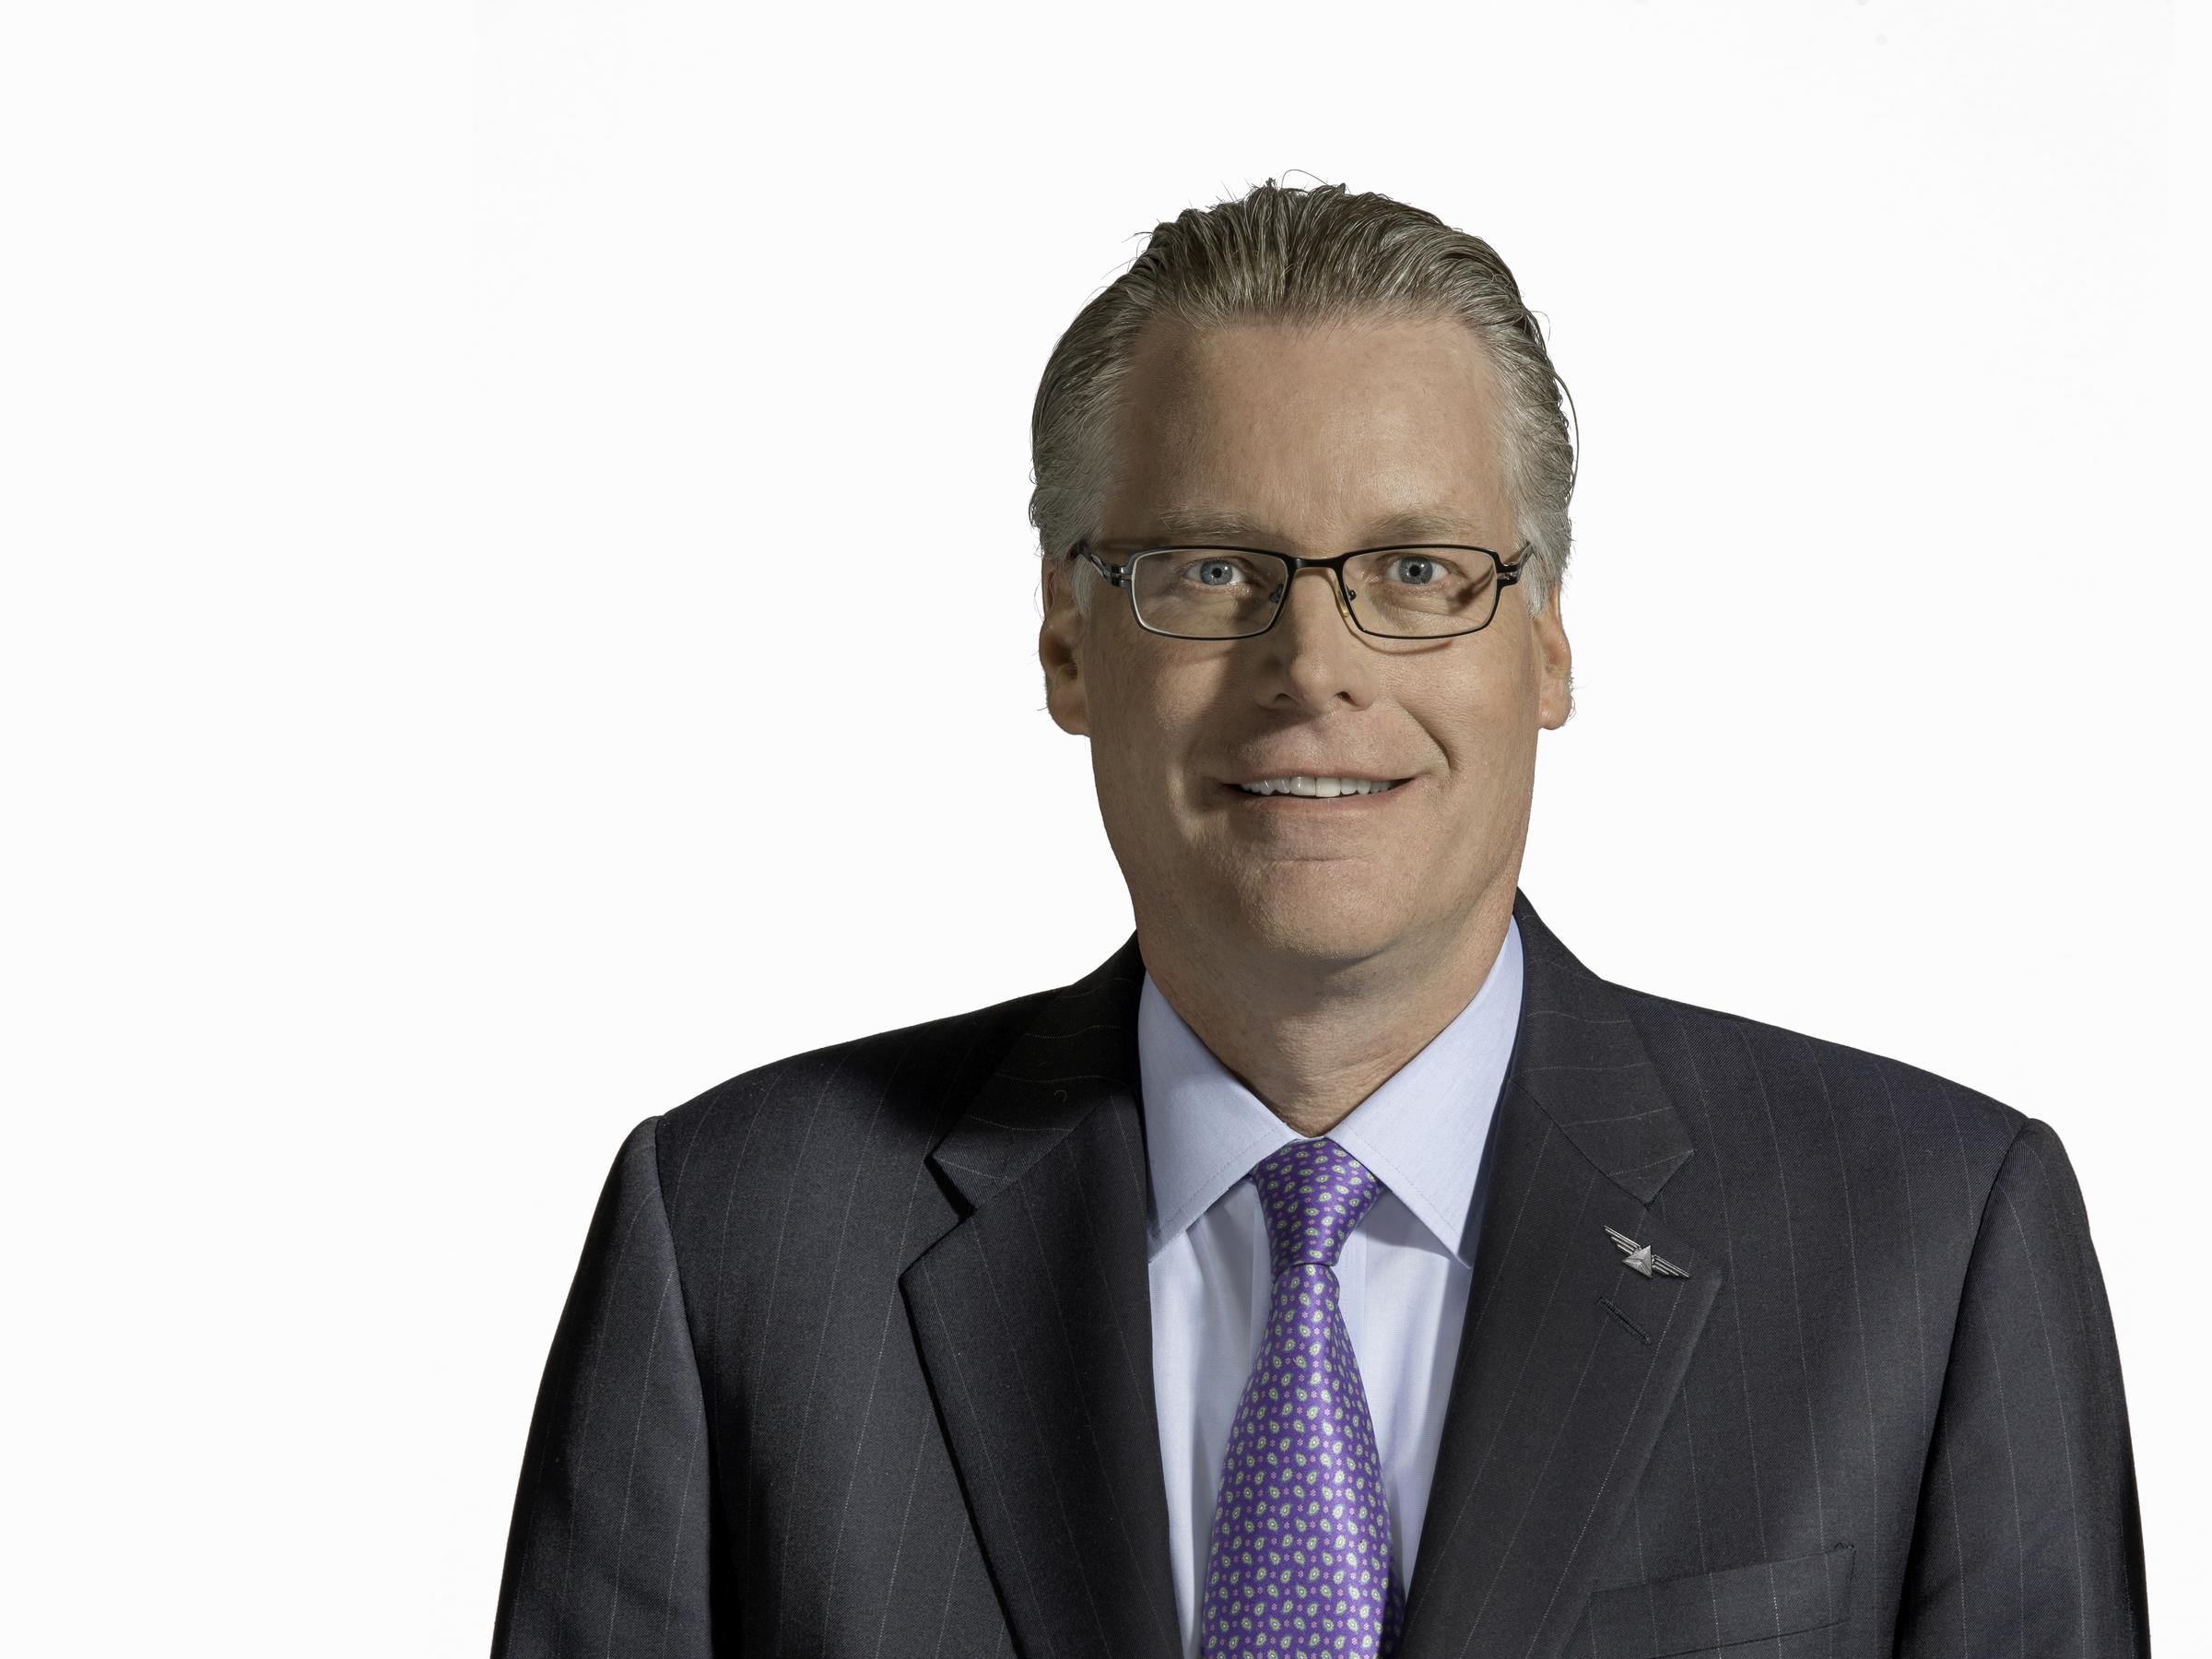 Ed Bastian Executive Headshot